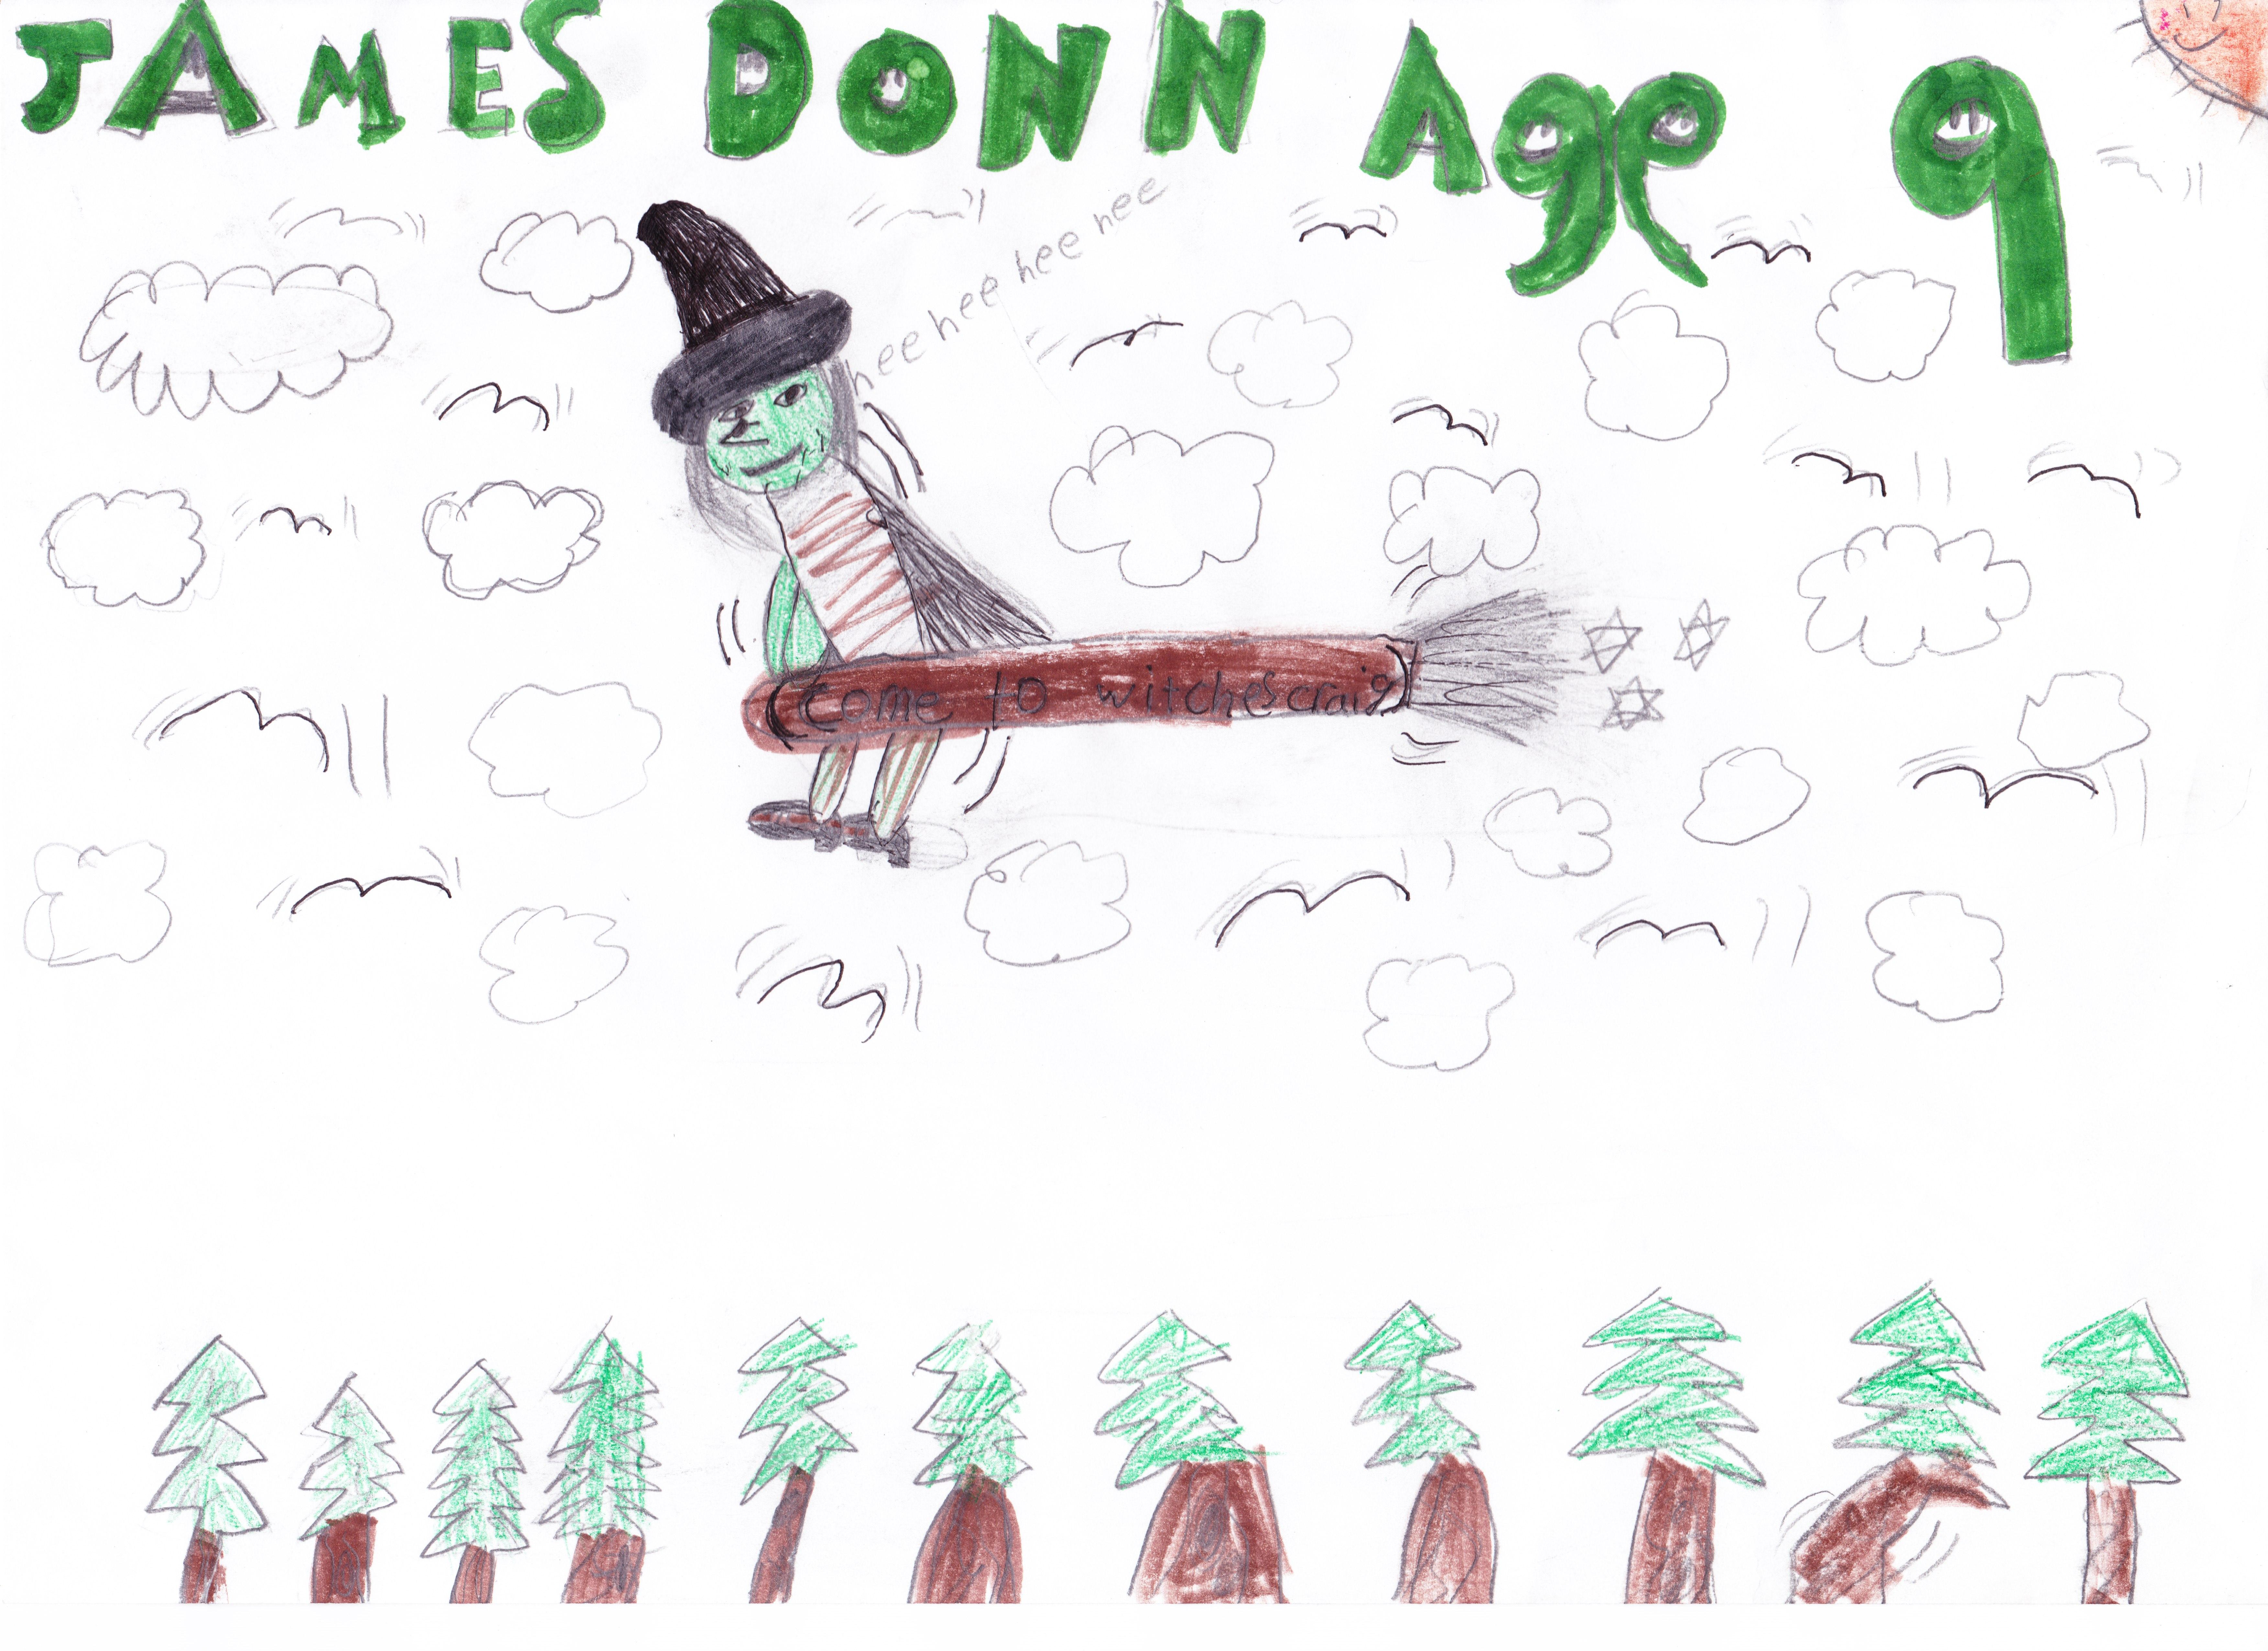 james donn, age 9[1]